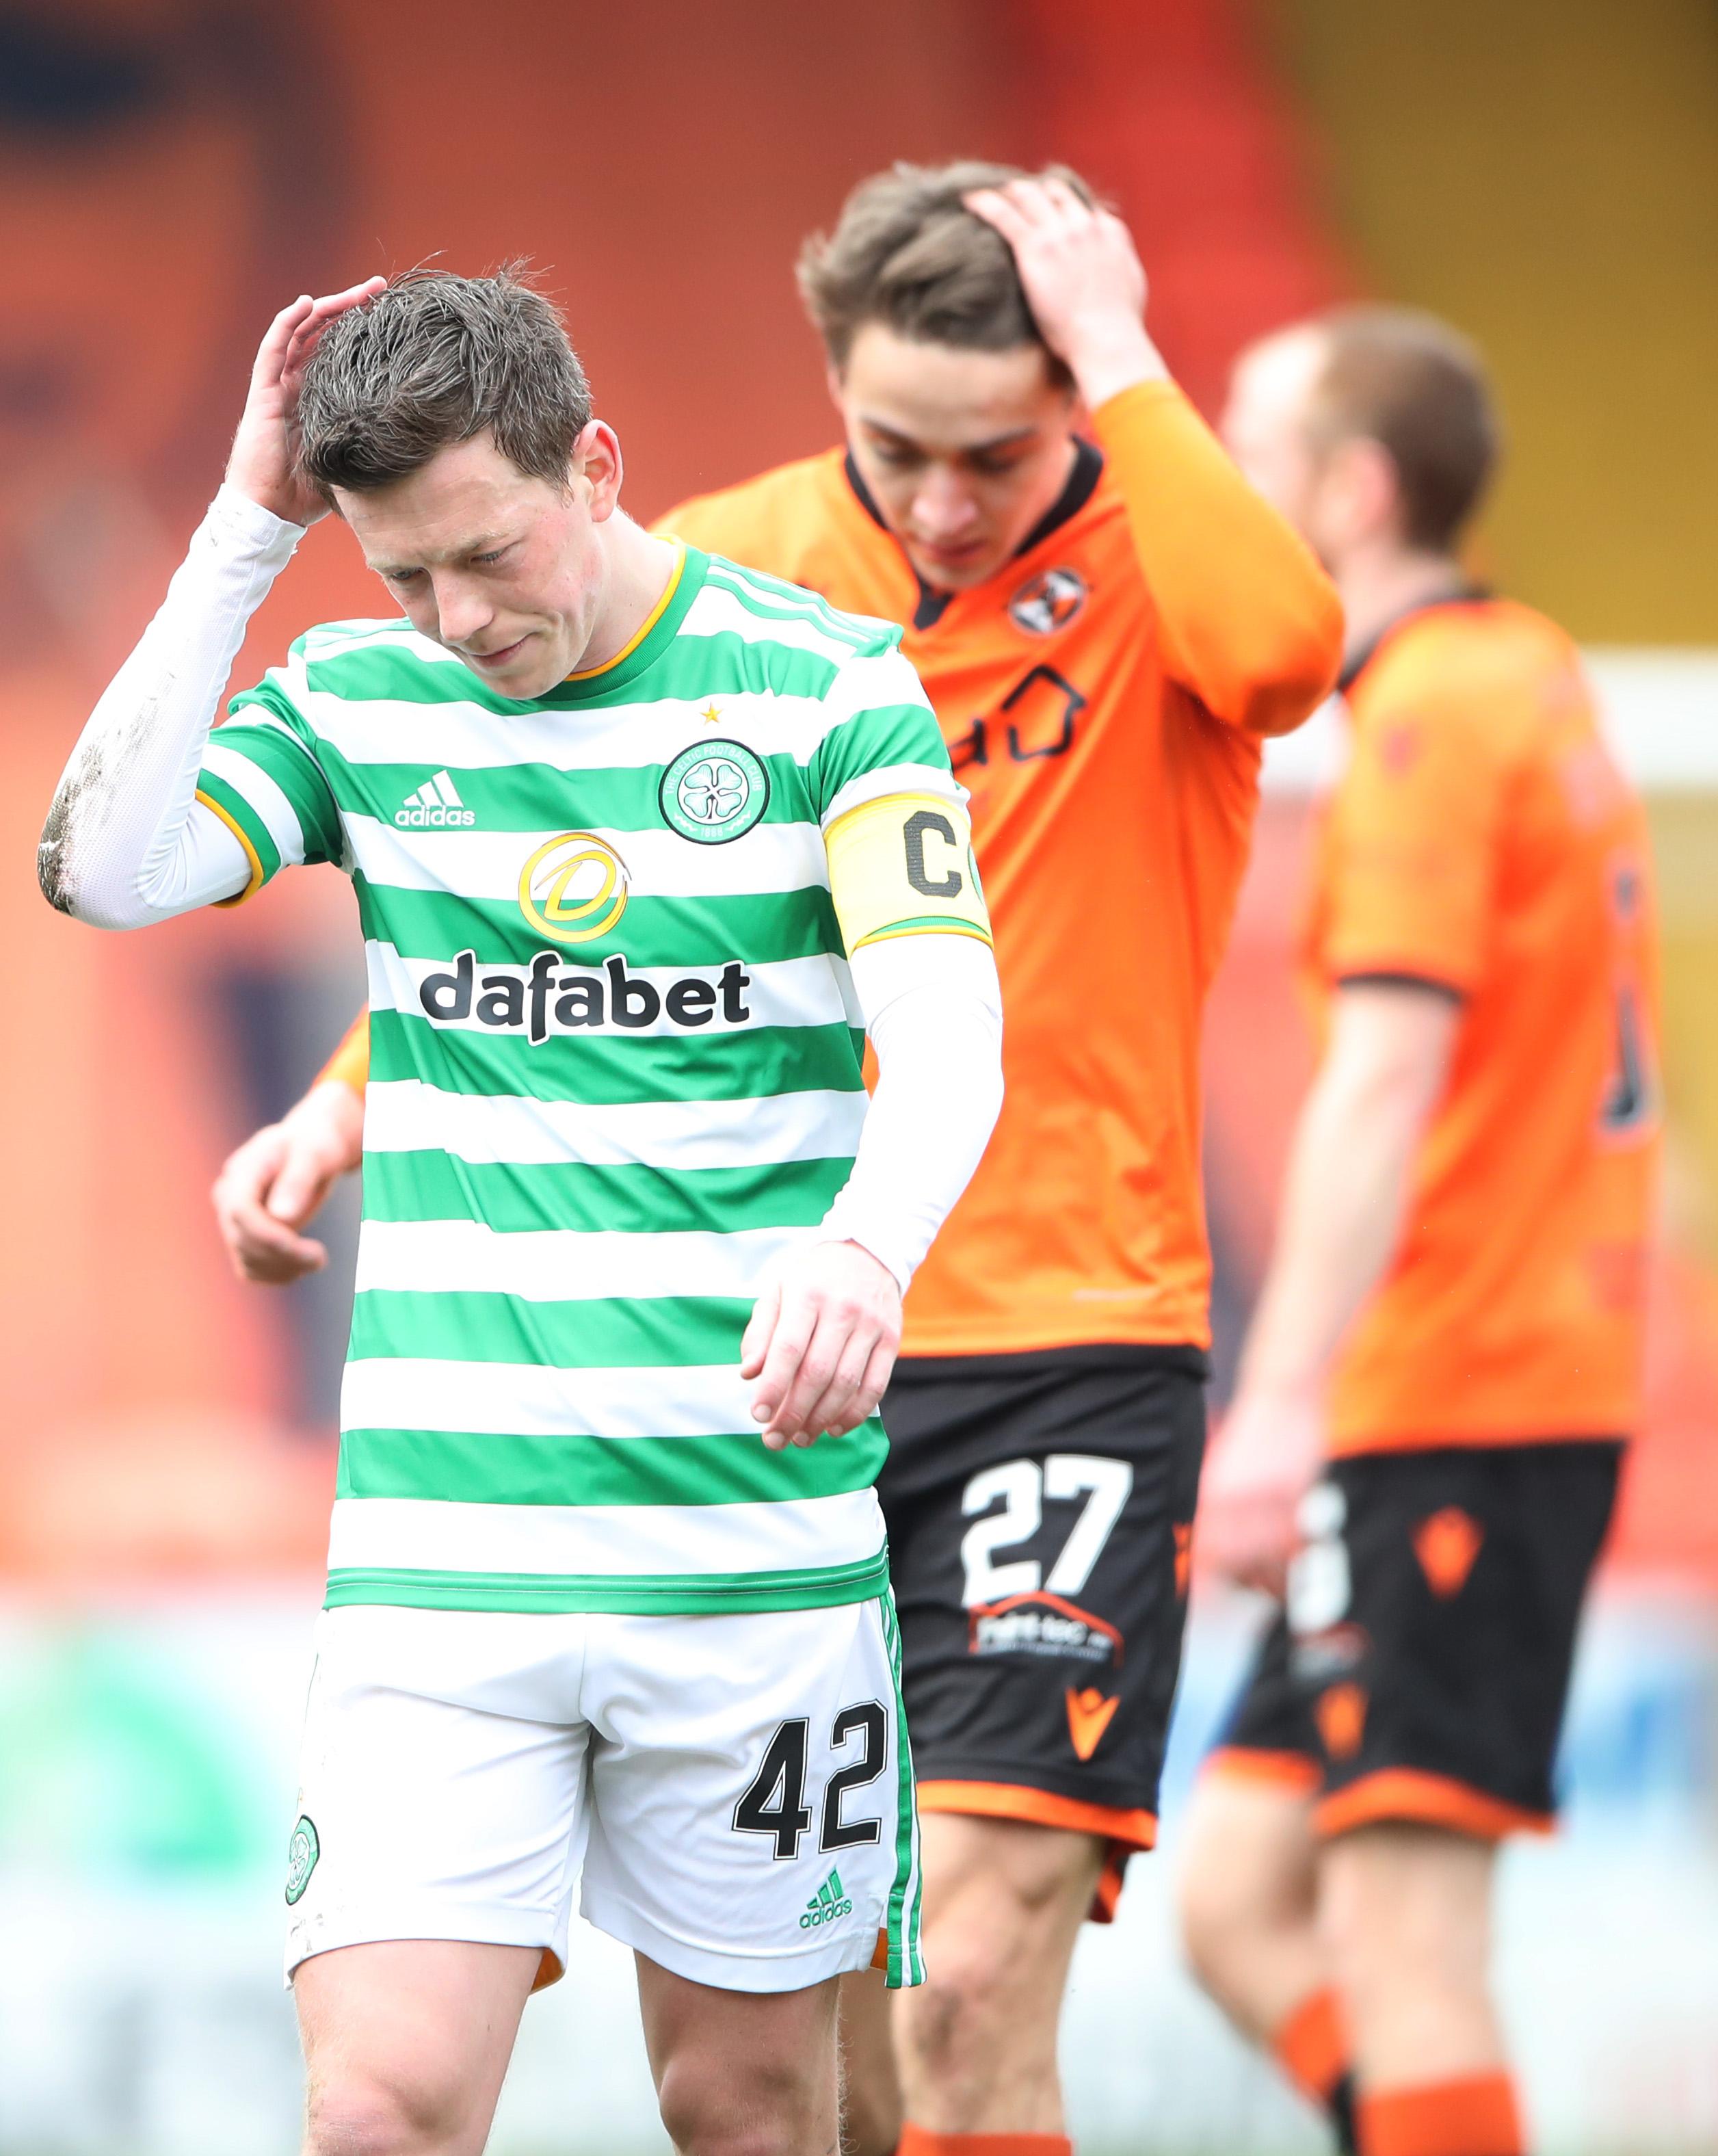 Dundee United v Celtic - Ladbrokes Scottish Premiership